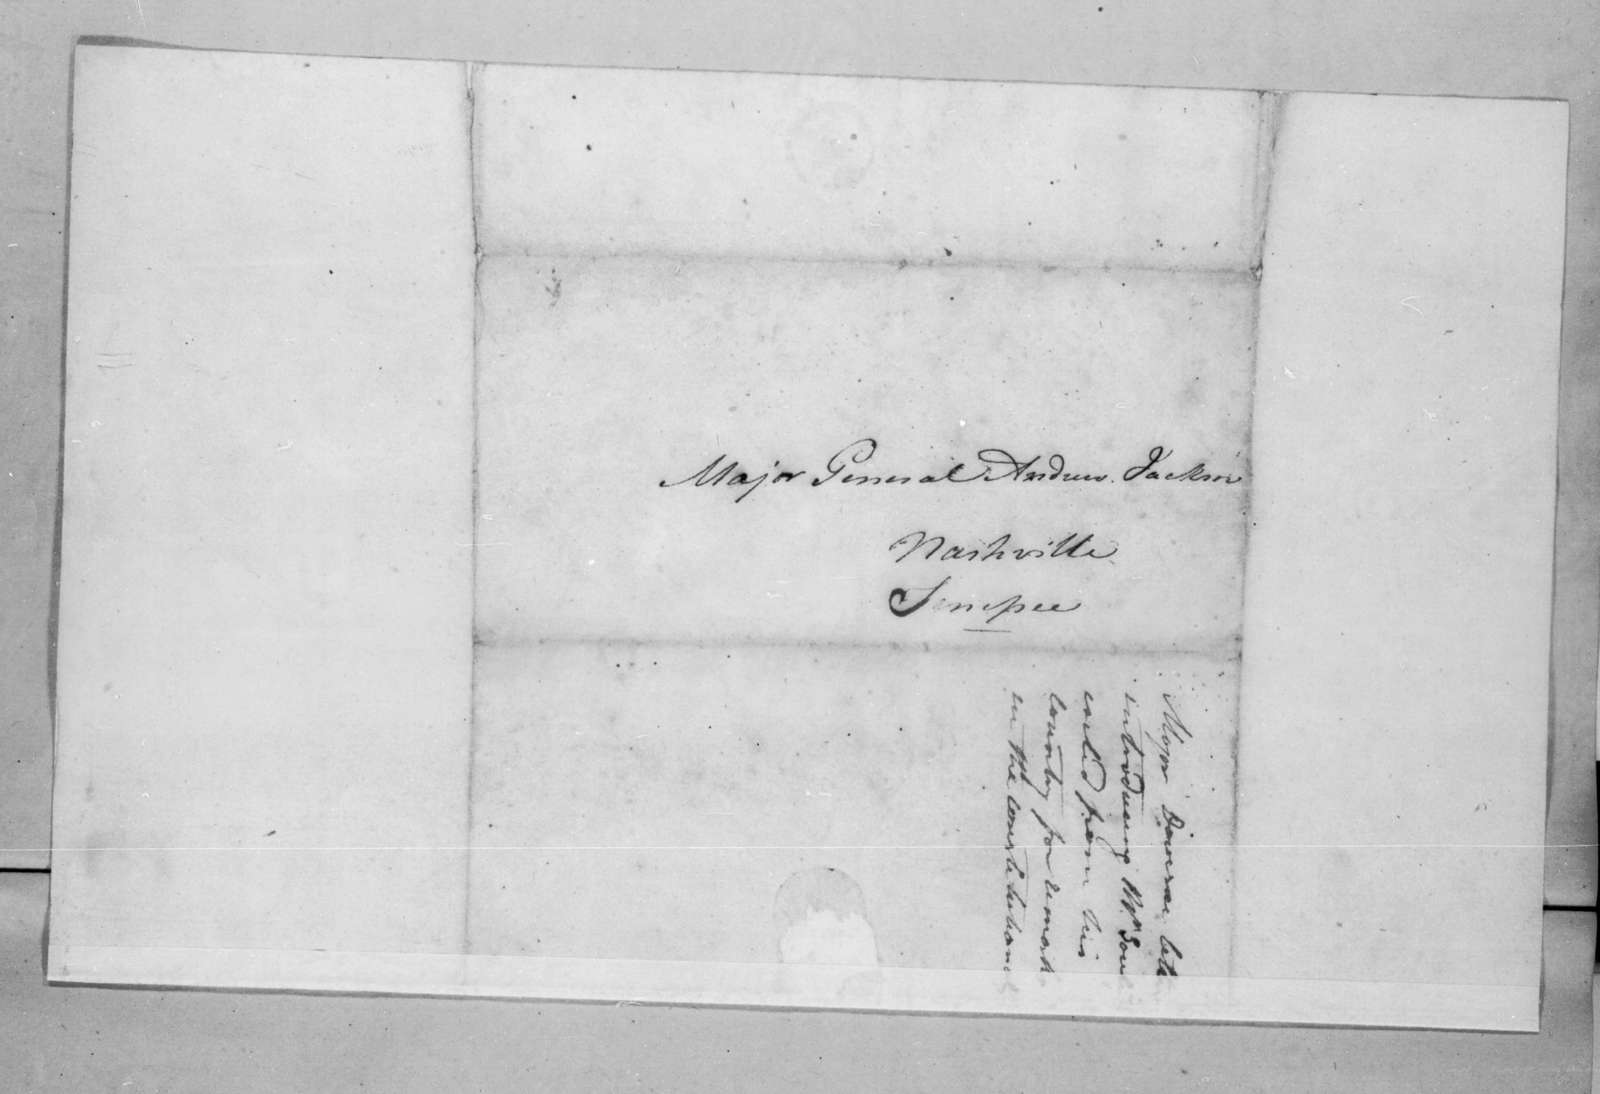 Auguste Genevieve Valentin Davezac to Andrew Jackson, April 11, 1825